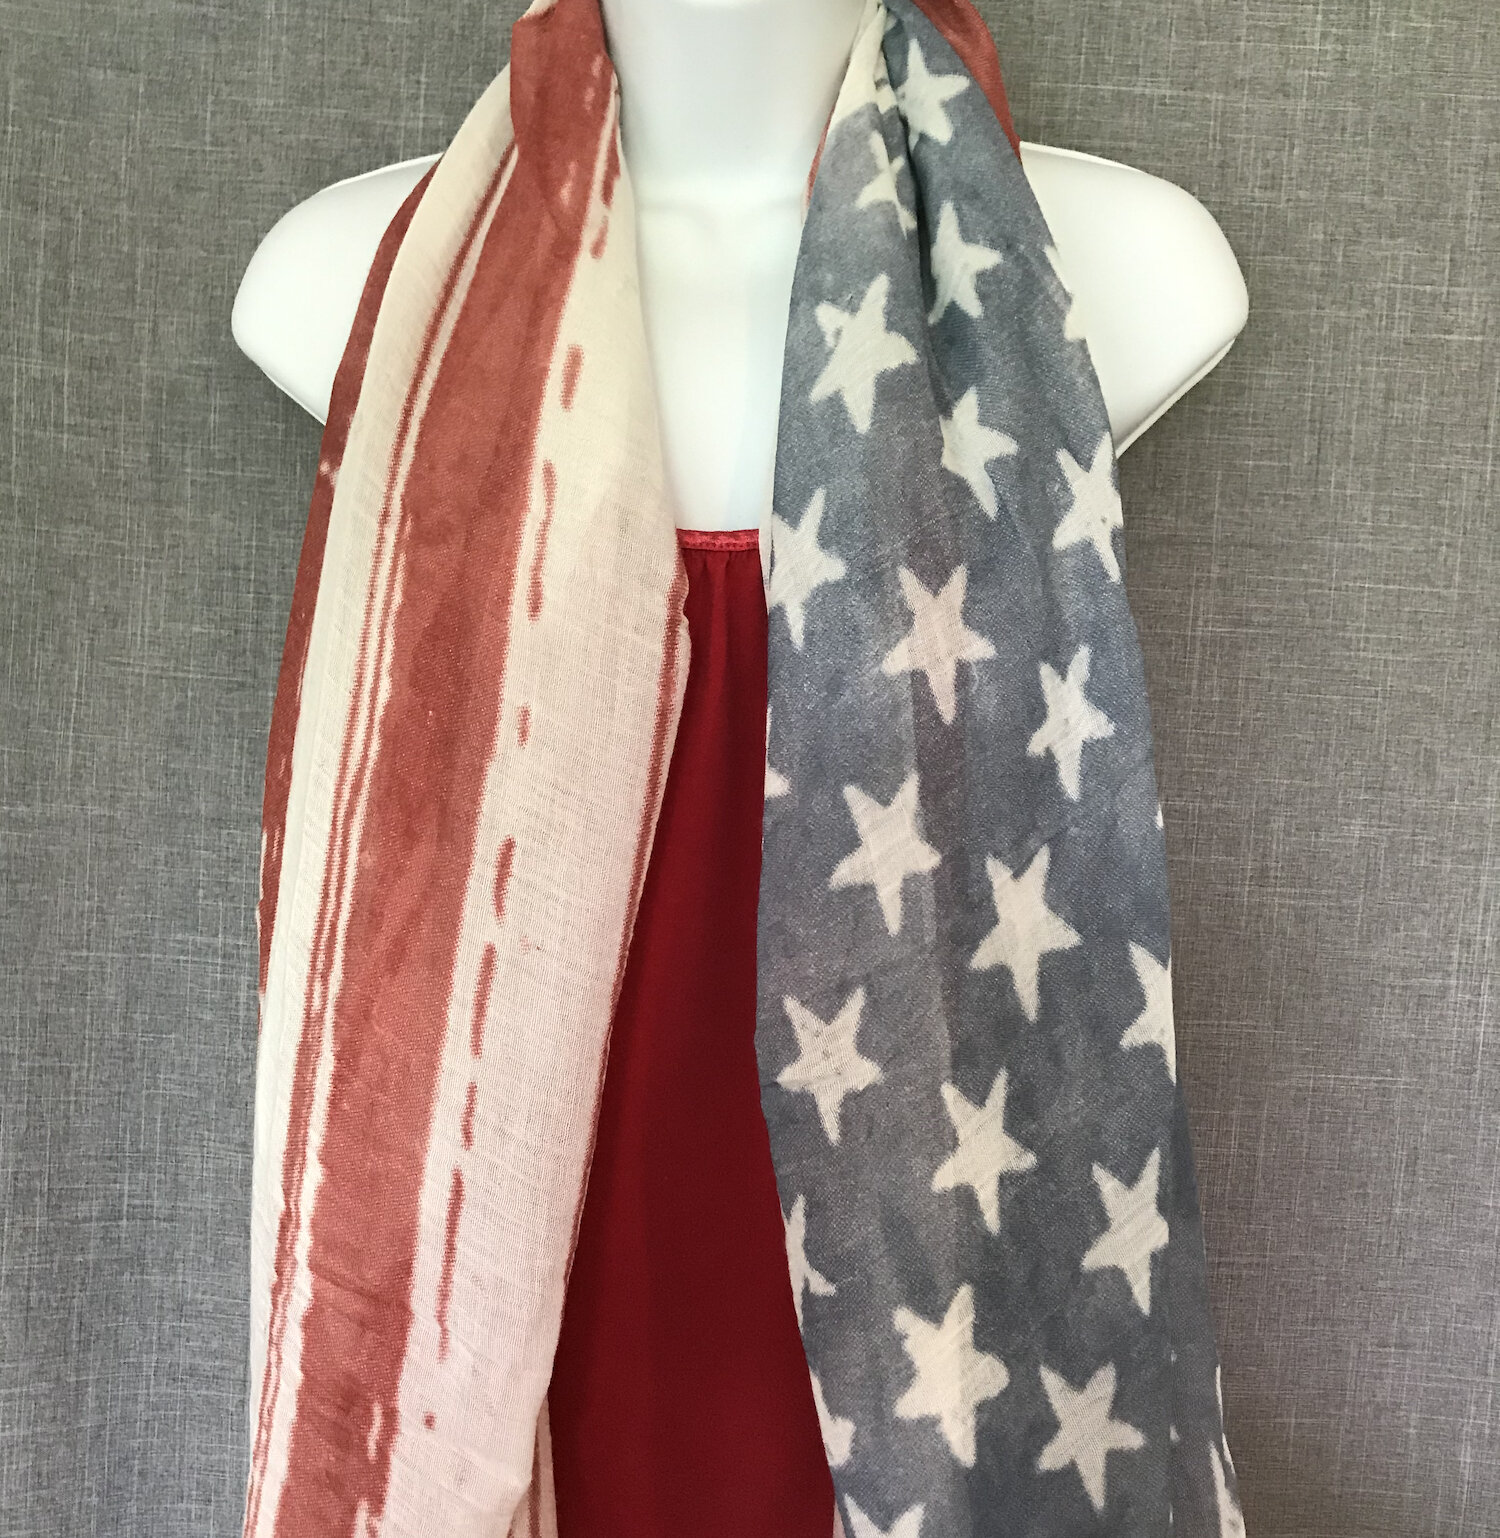 Many designs of Patriotic Scarves